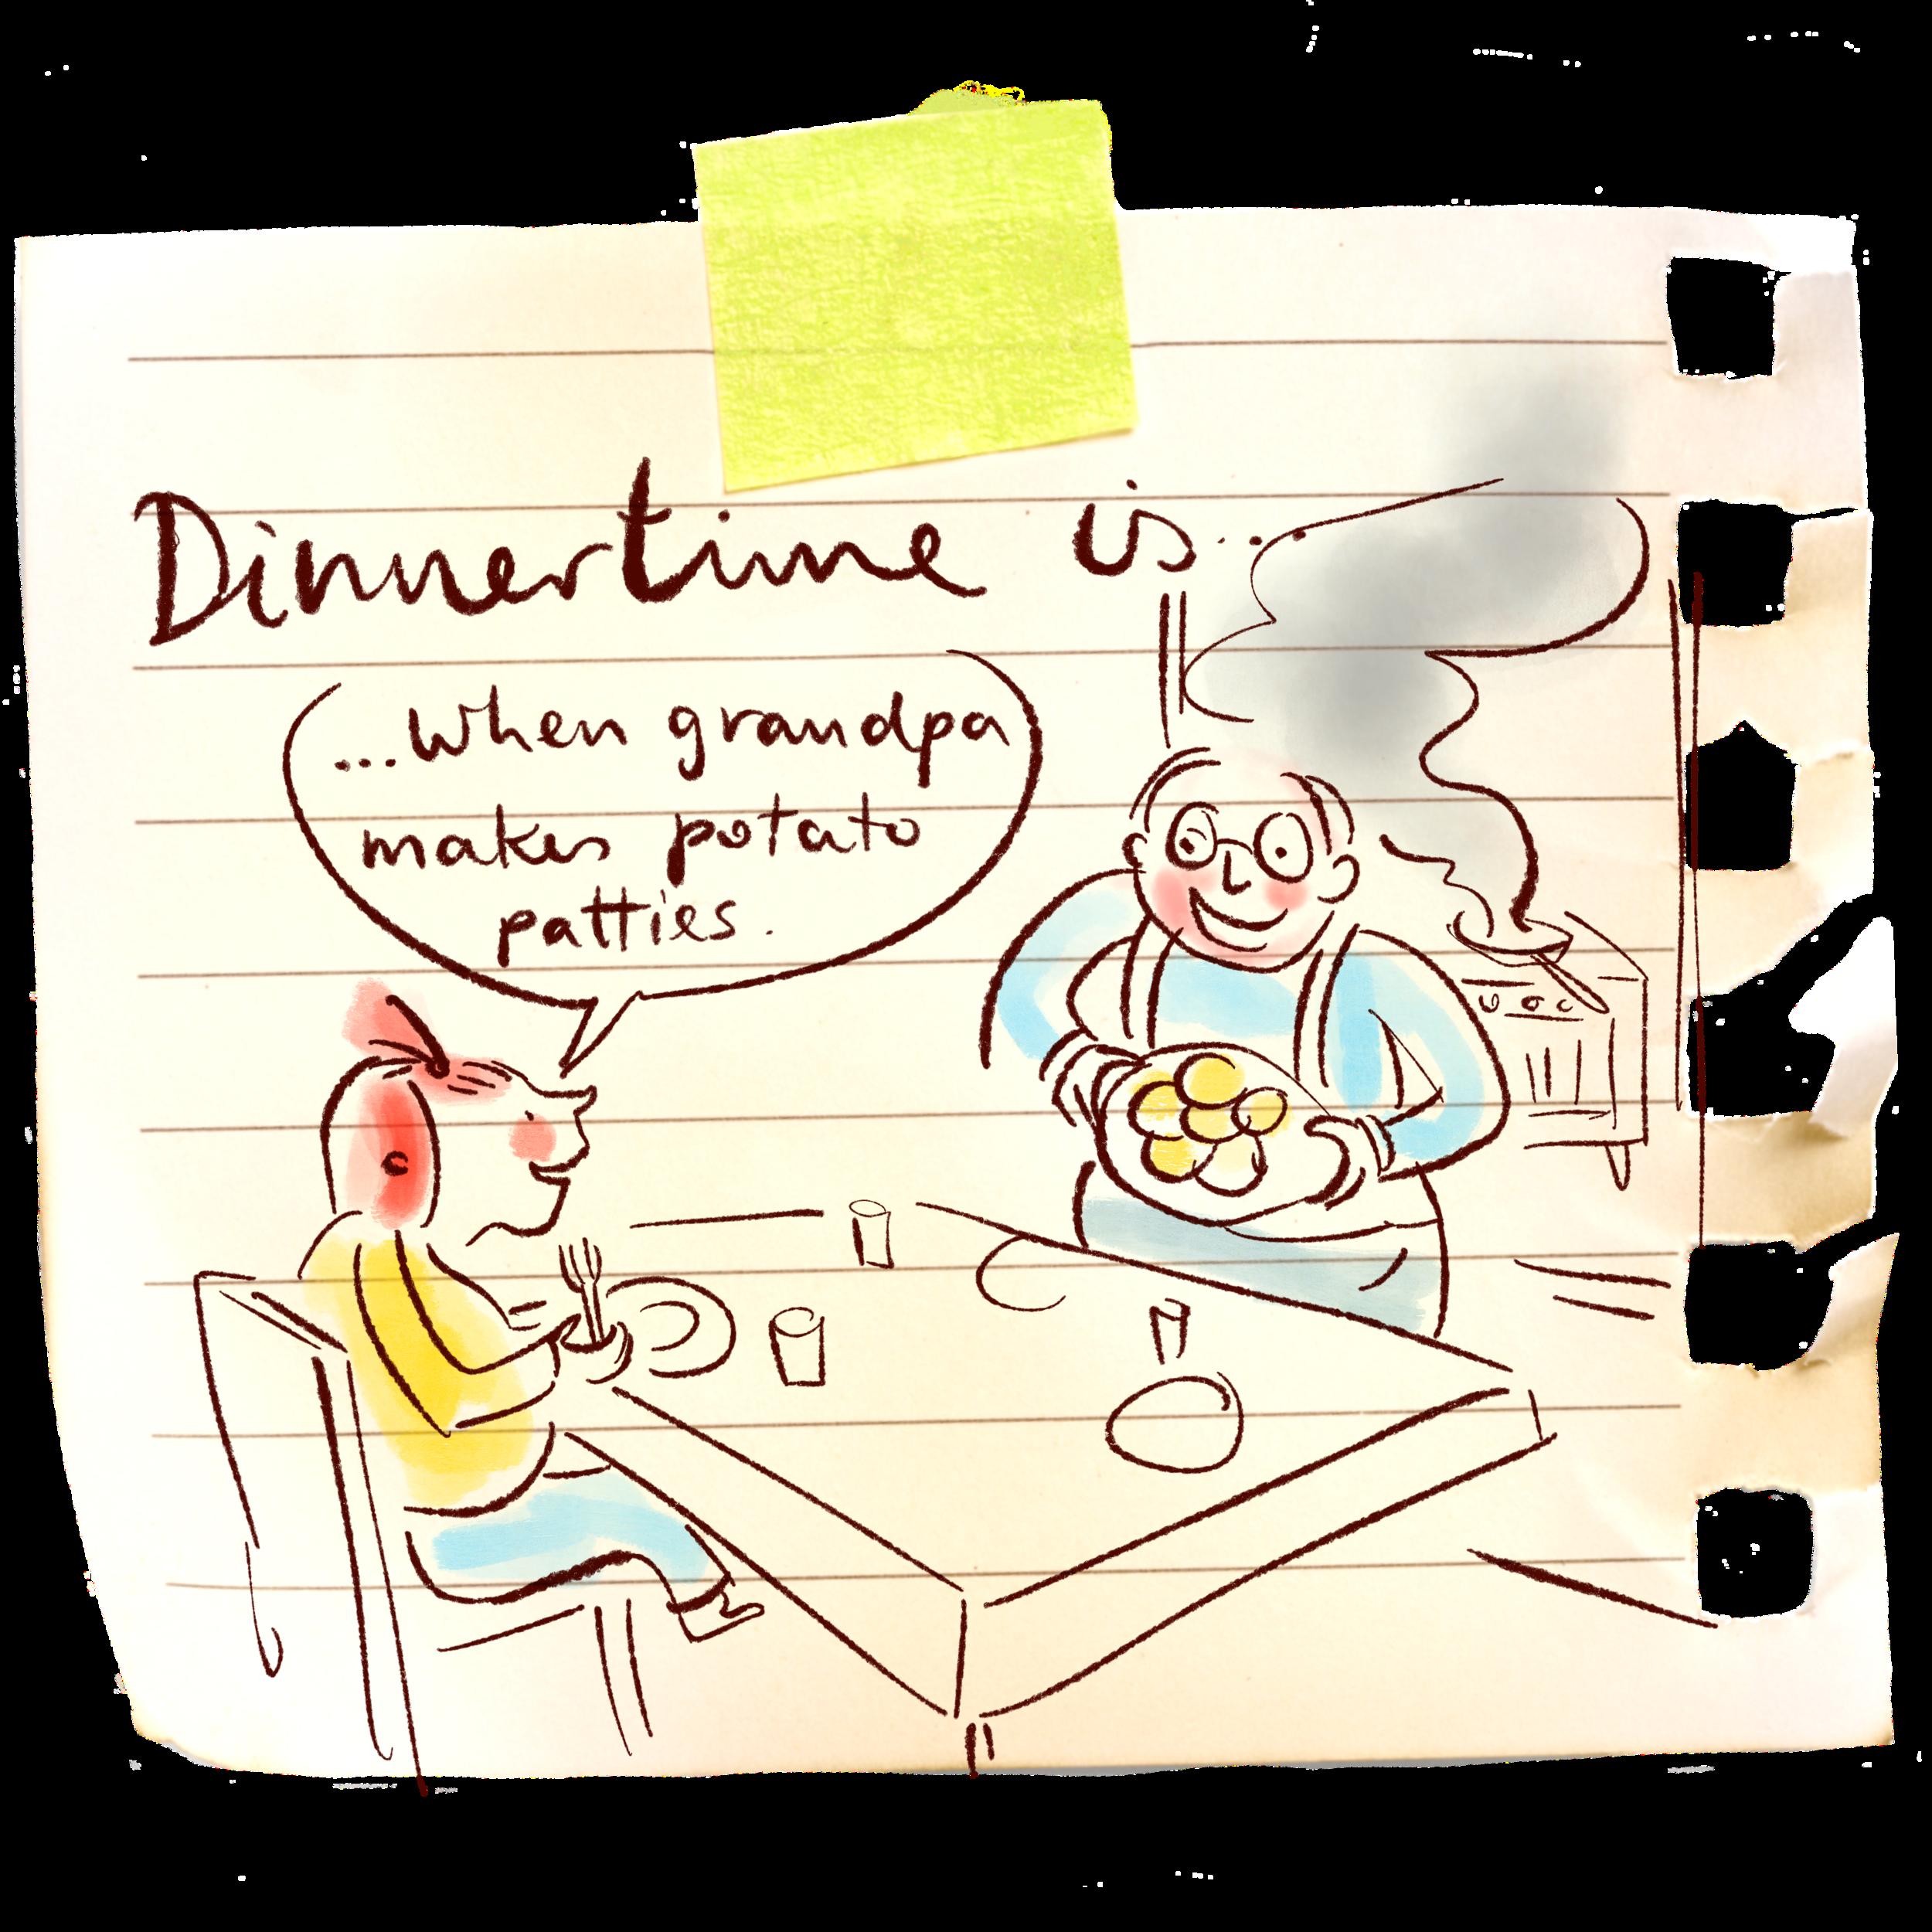 dinnertime-memories.png